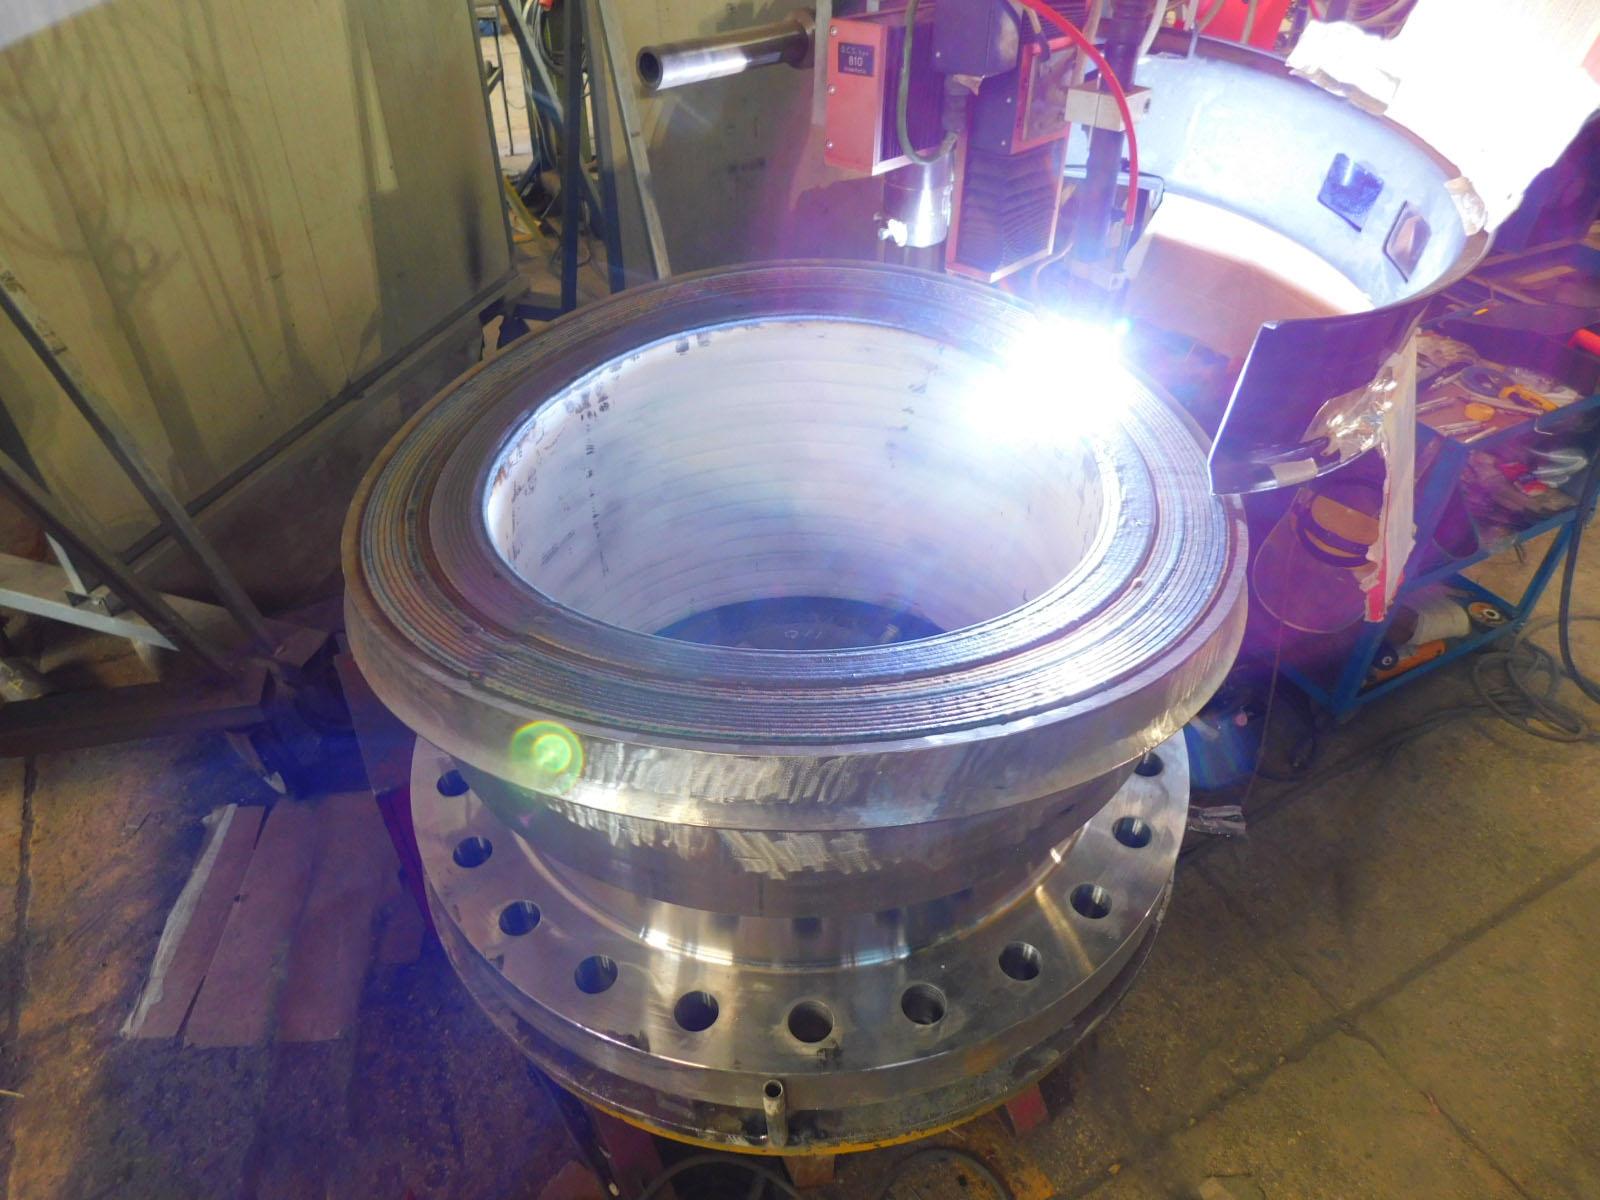 Weld Overlay on Nozzles Sa182 F22 + SS347 Hot GTAW Semiautomatic